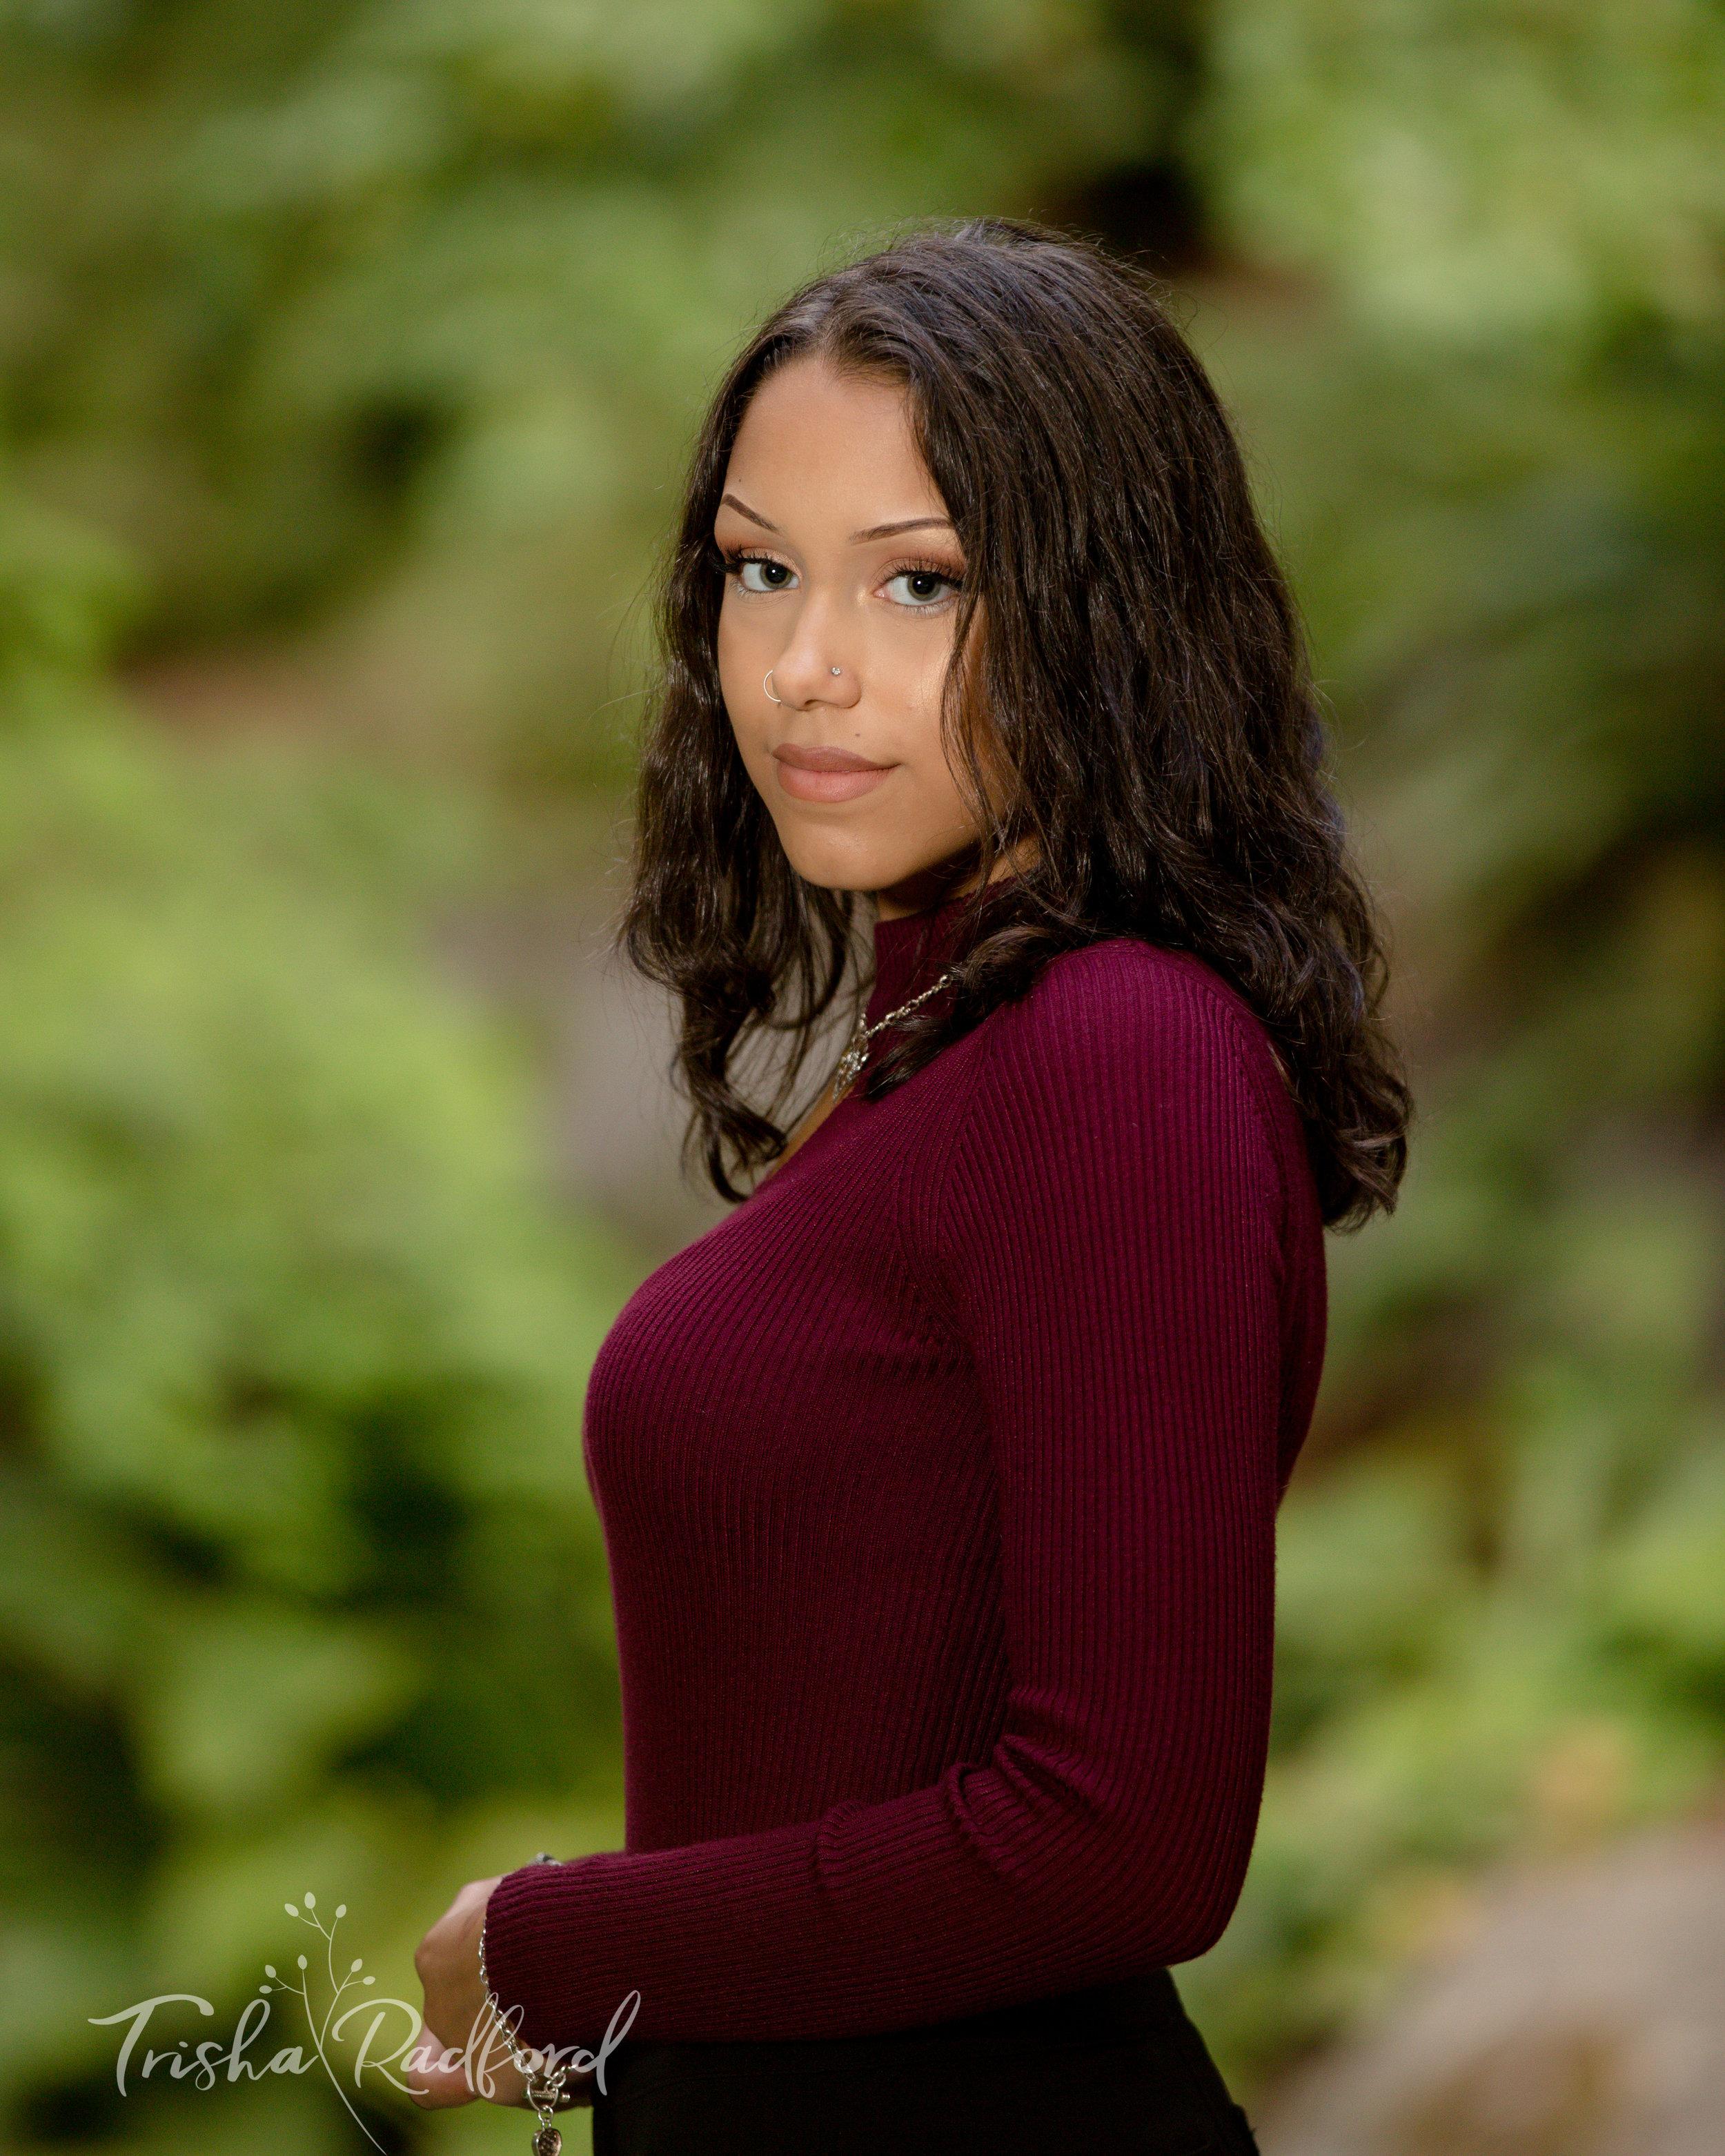 Senior Portrait Photographer Snohomish County WA